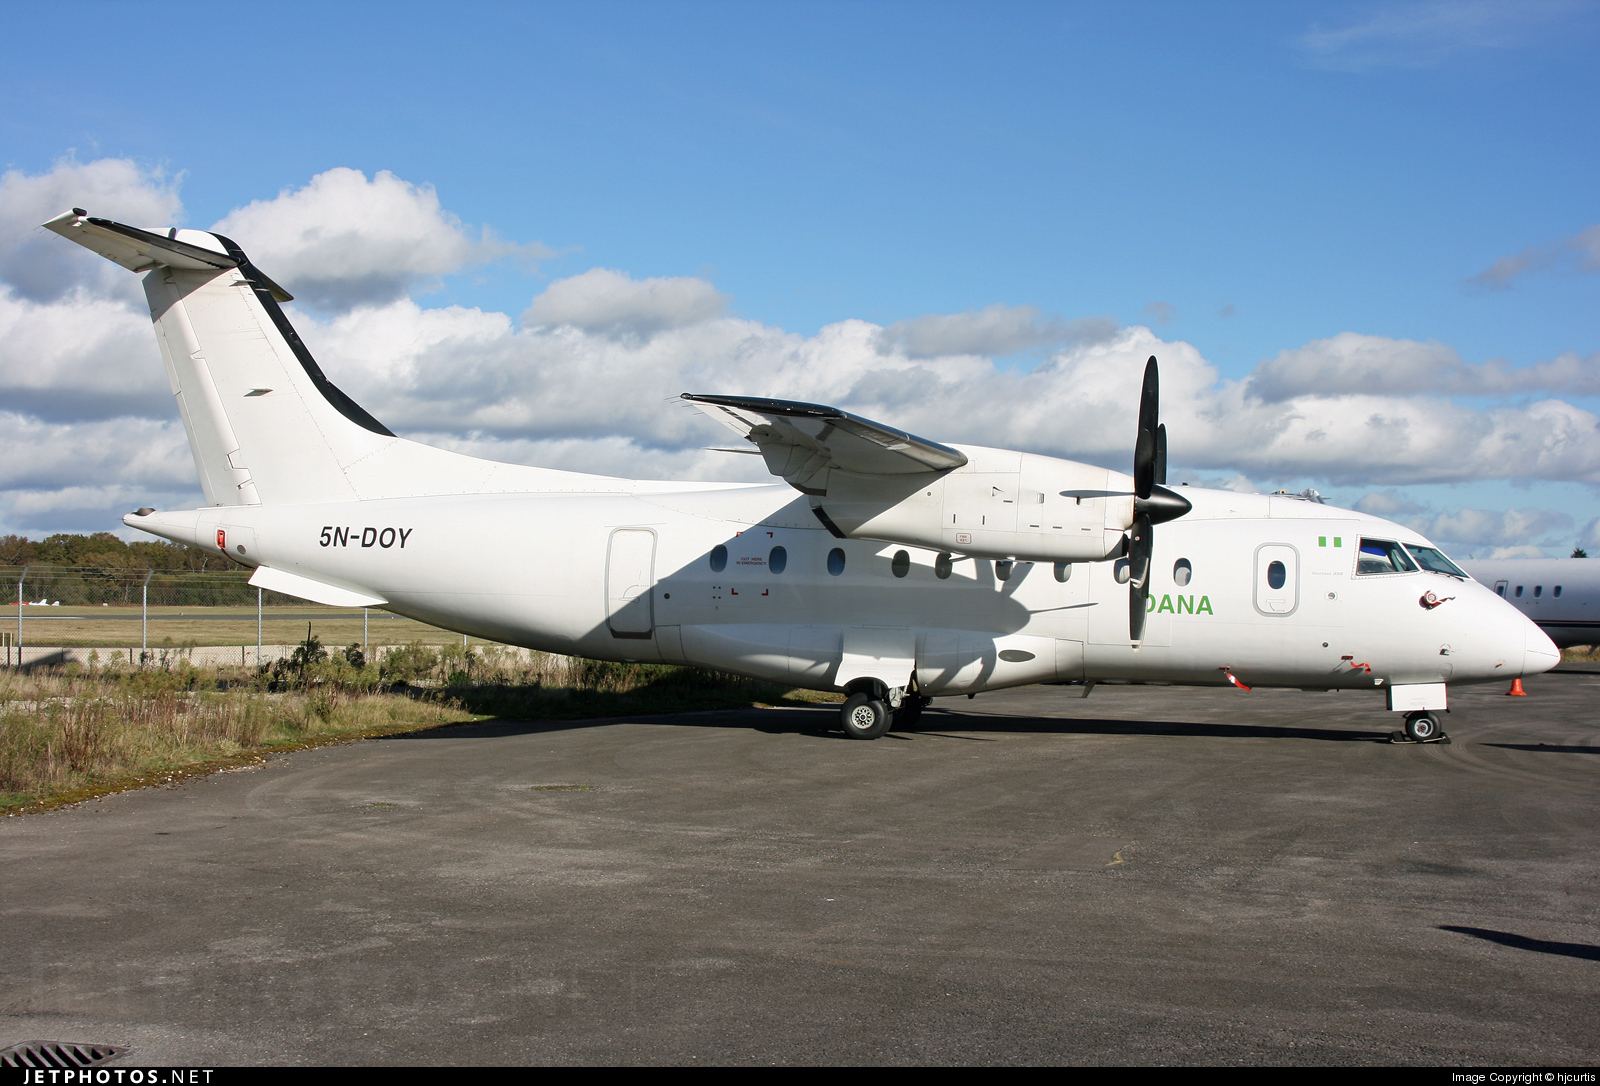 5N-DOY | Dornier Do-328-110 | Dornier | hjcurtis | JetPhotos